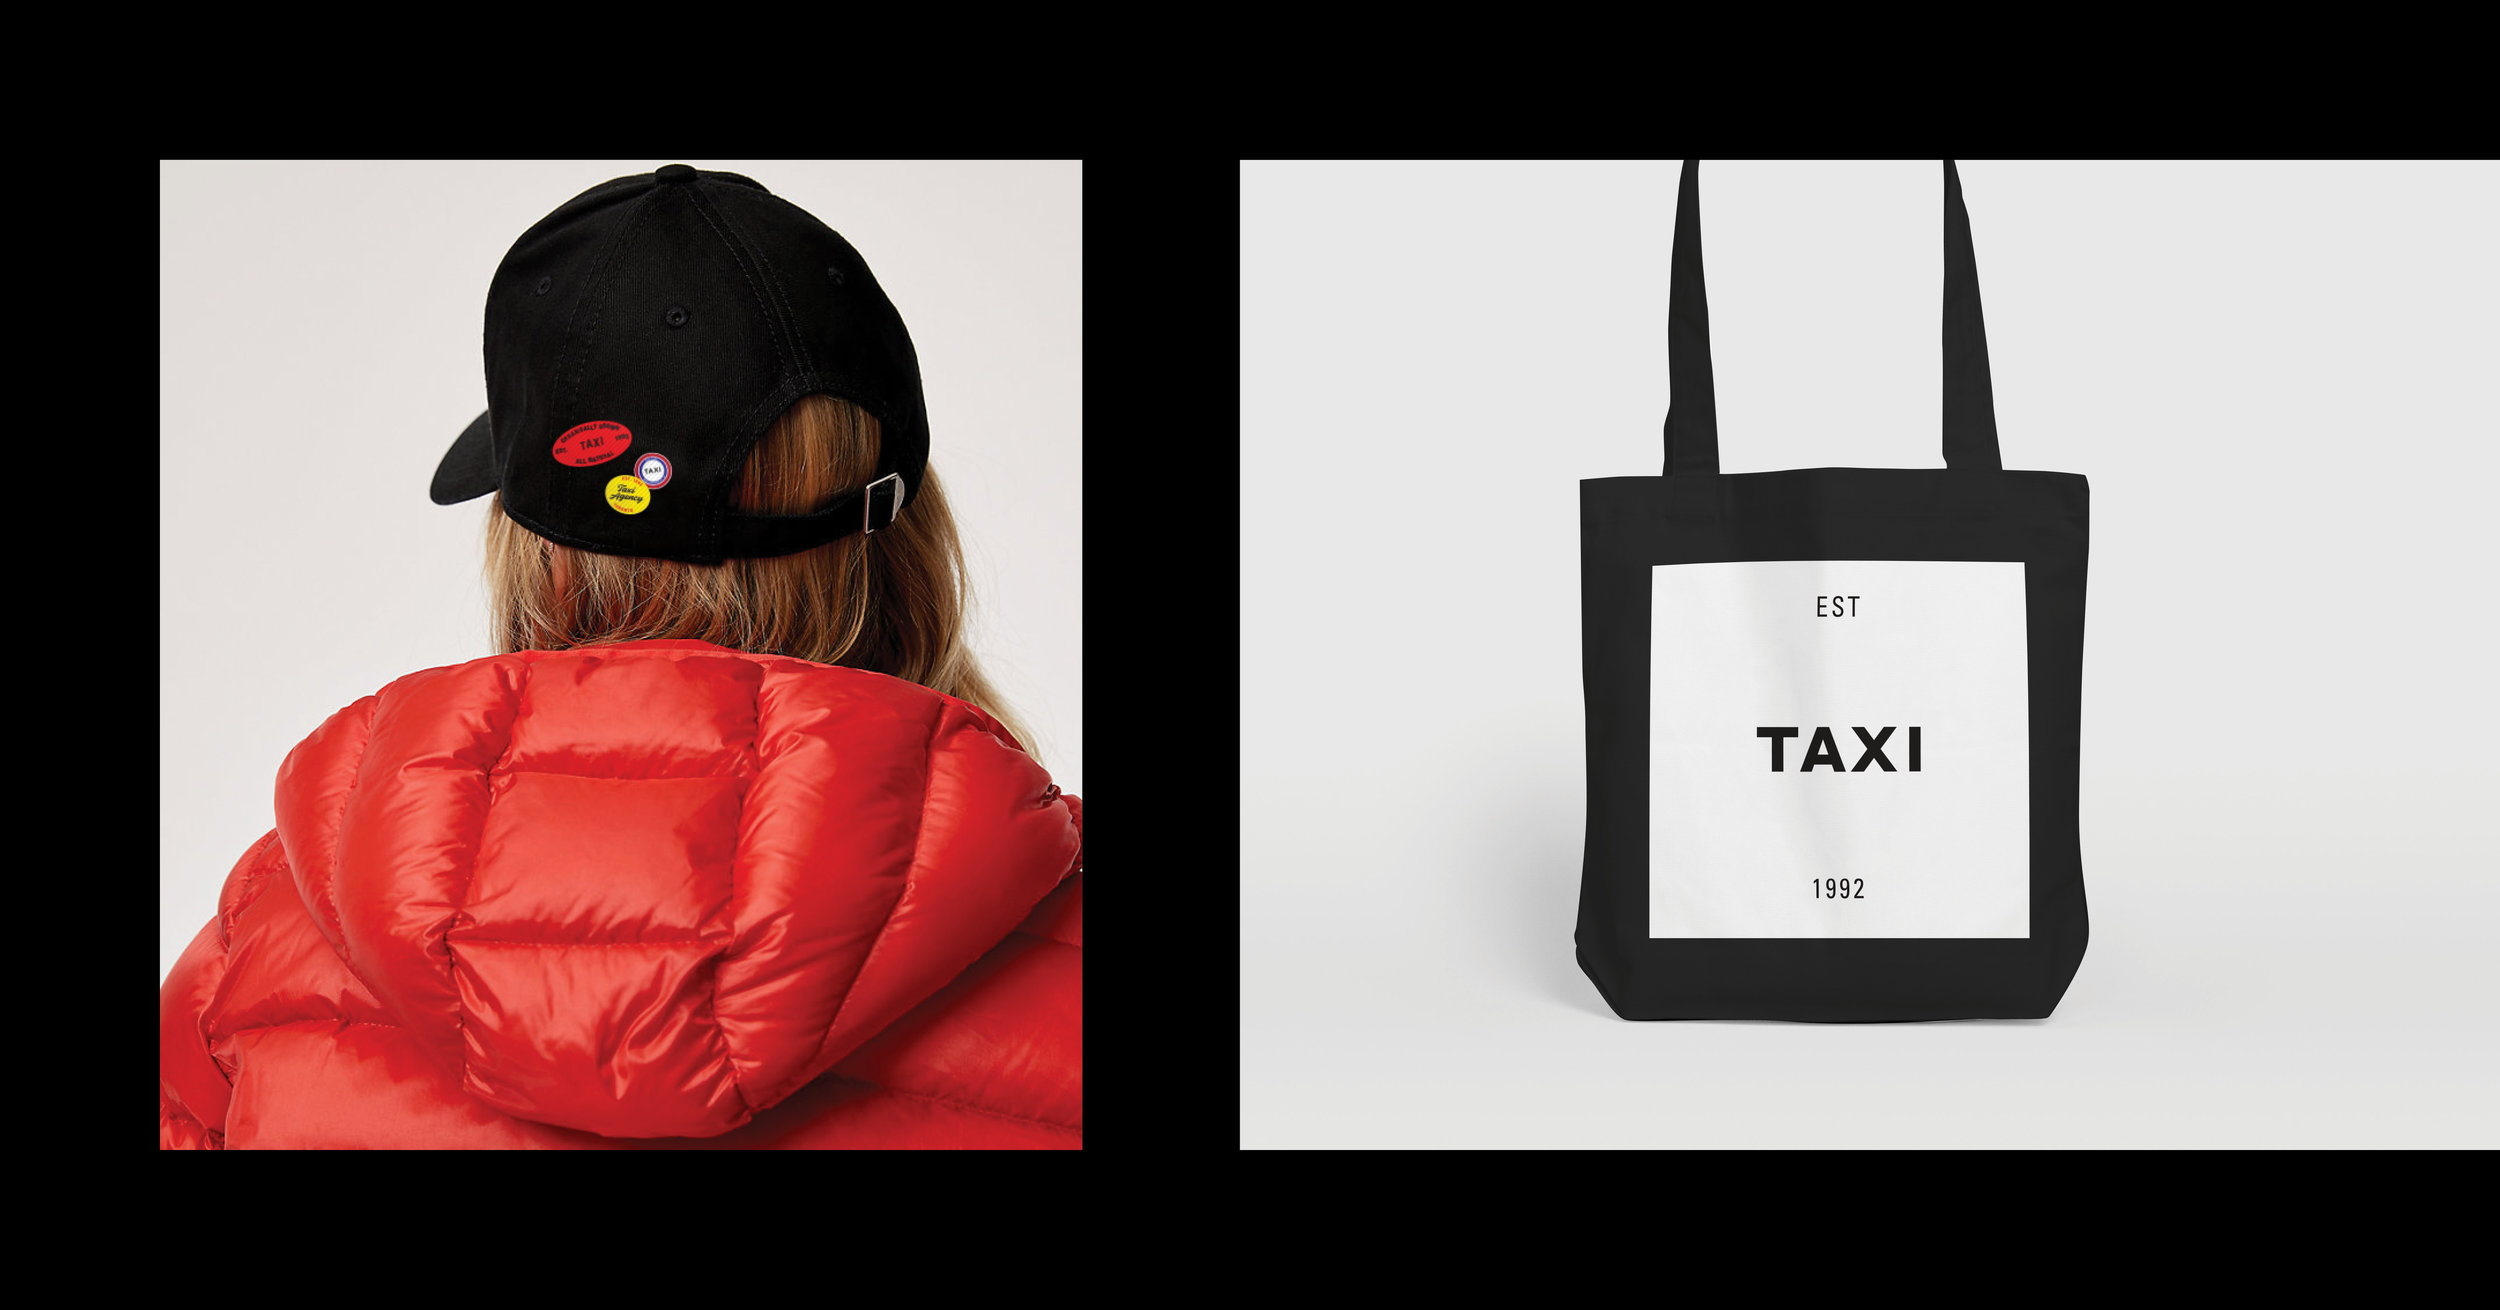 TAXI_Swag_Slides2.jpg